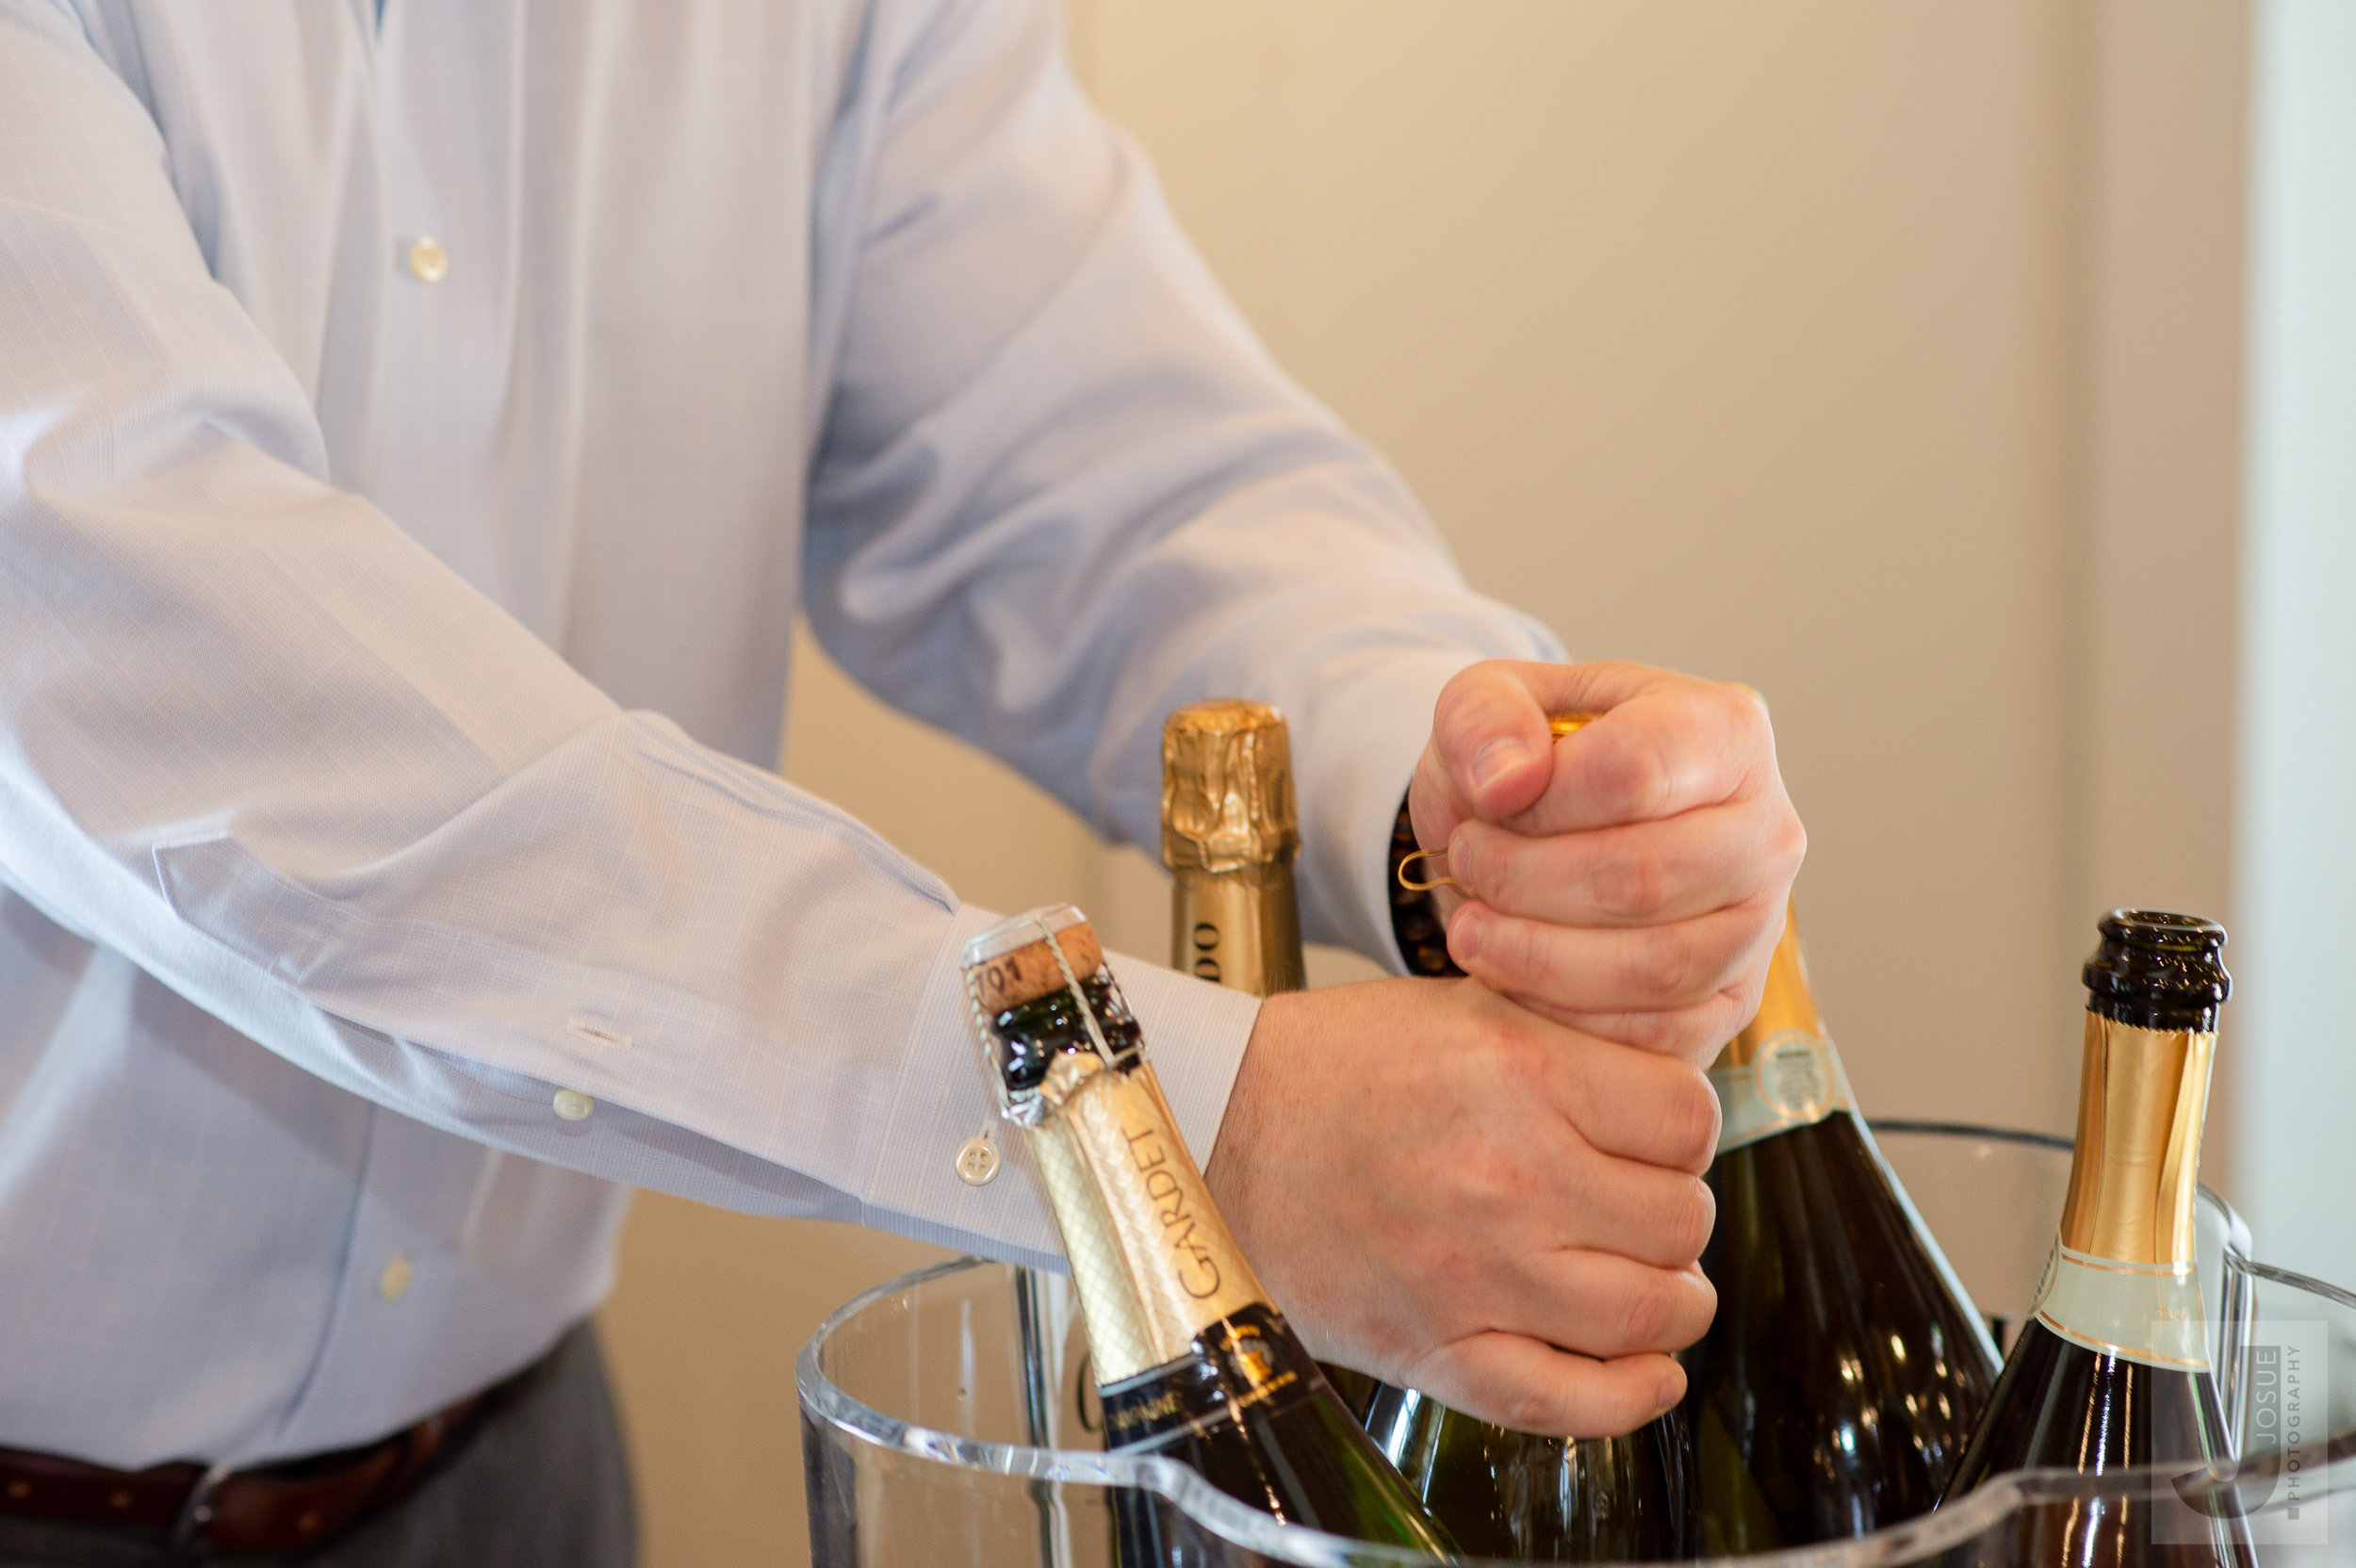 060518_Champagne&Caviar-32 copy.jpg